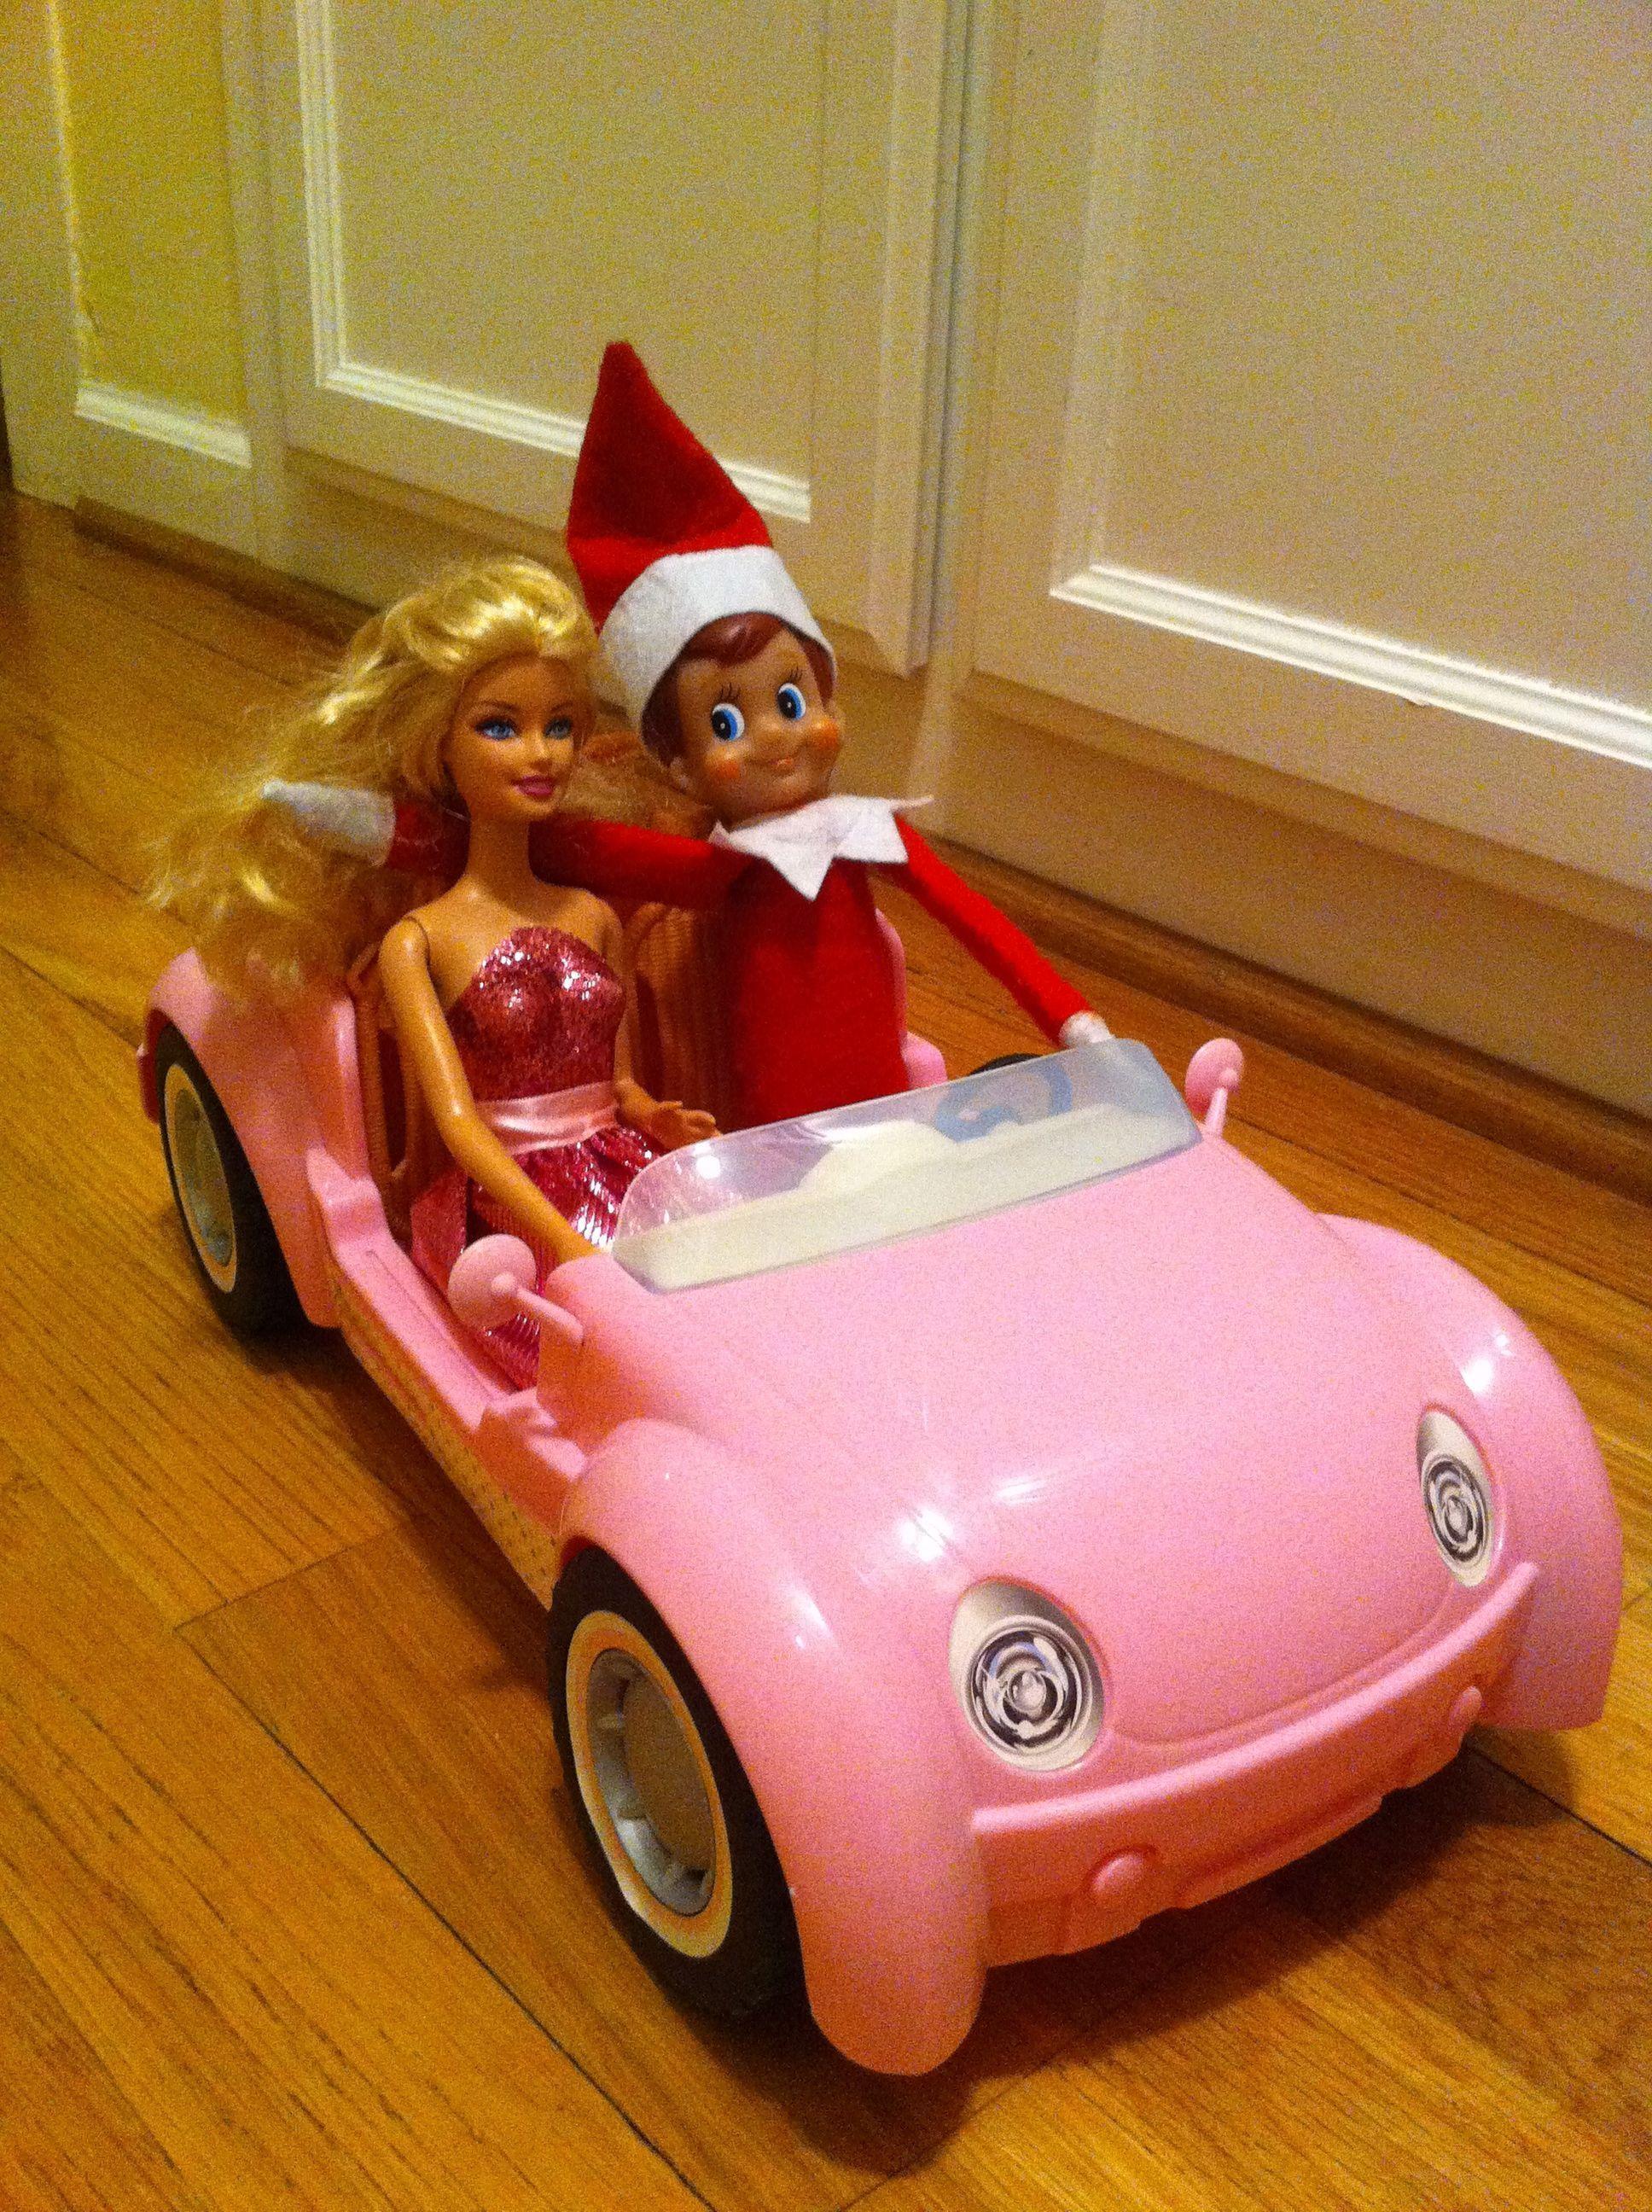 Elf on the Shelf Barbie Car #barbiecars Elf on the Shelf Barbie Car #barbiecars Elf on the Shelf Barbie Car #barbiecars Elf on the Shelf Barbie Car #barbiecars Elf on the Shelf Barbie Car #barbiecars Elf on the Shelf Barbie Car #barbiecars Elf on the Shelf Barbie Car #barbiecars Elf on the Shelf Barbie Car #barbiecars